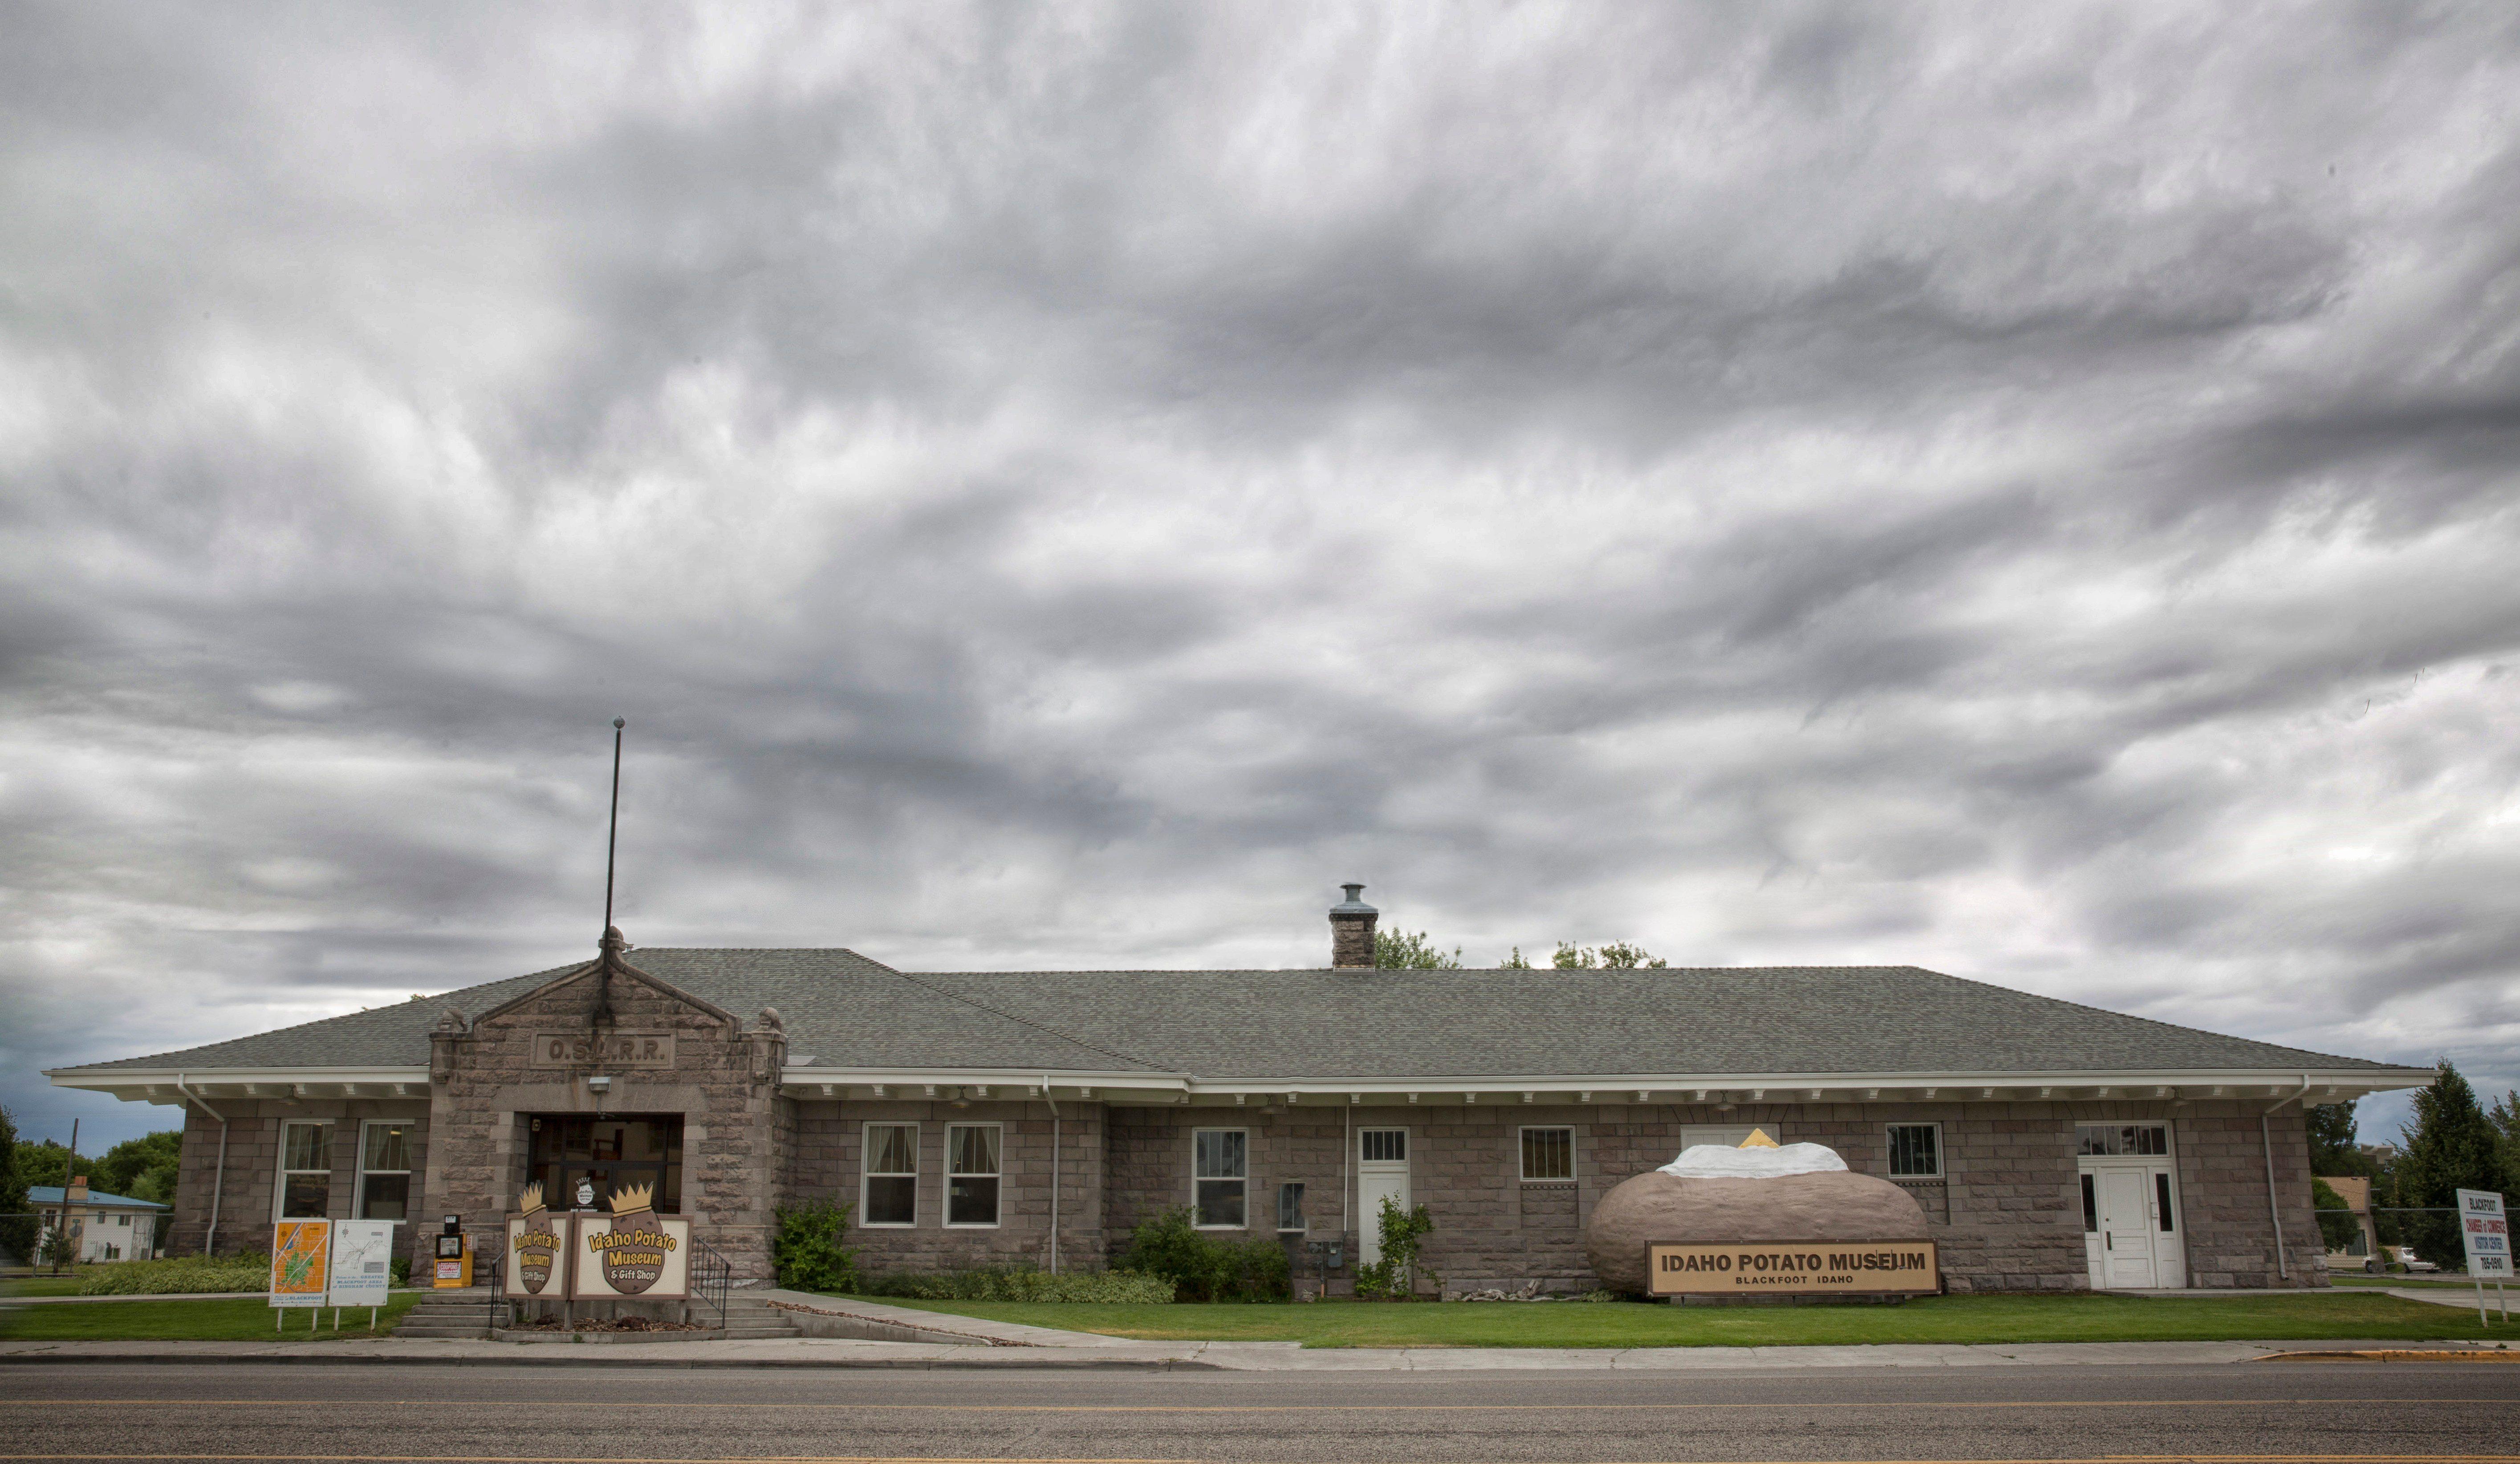 Idaho Potato Museum